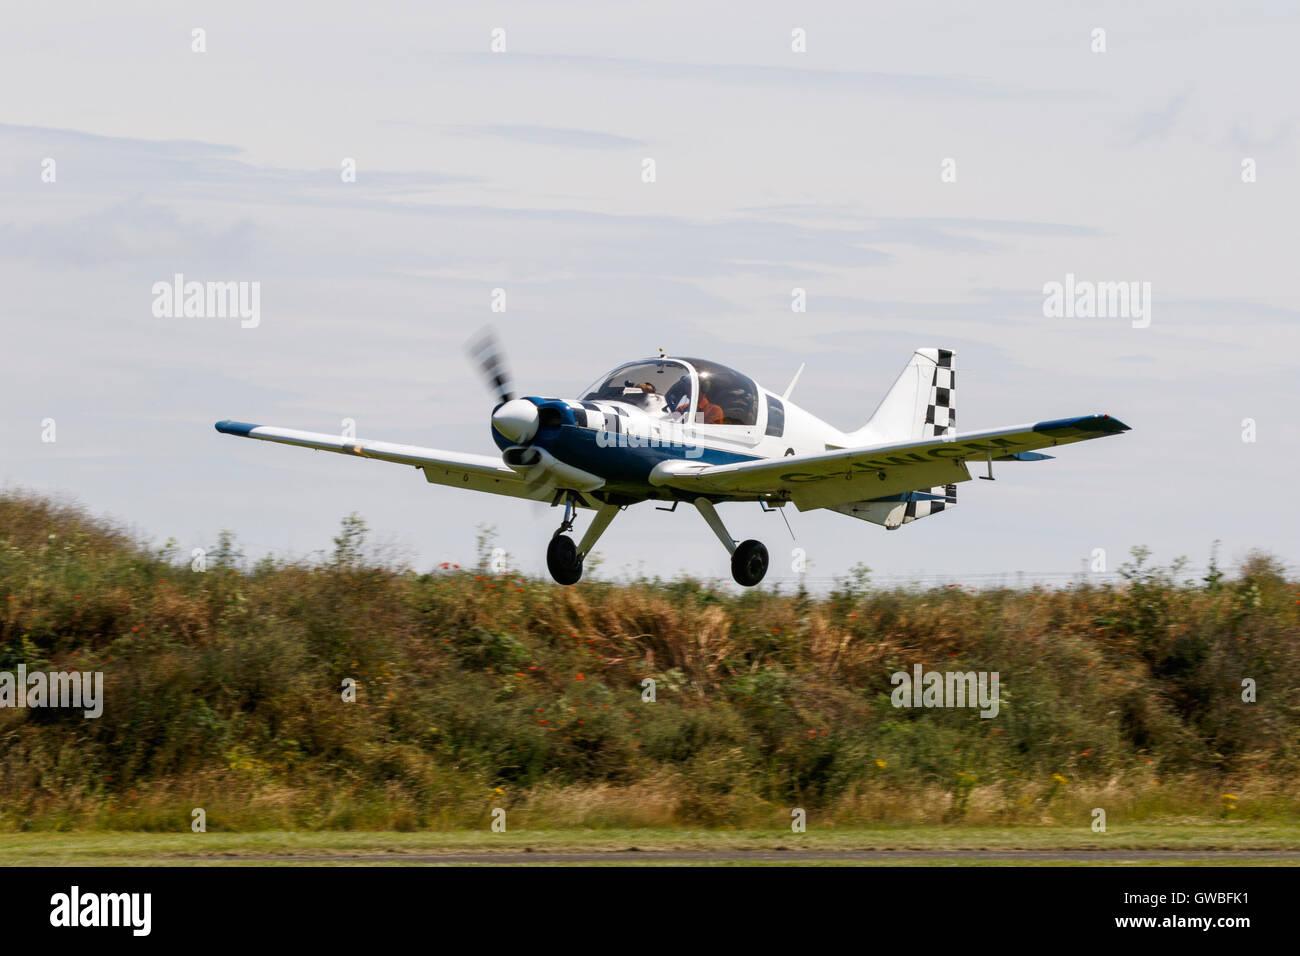 British Aerospace 120 Model 1210 Bulldog G-JWCM landing at Breighton Airfield - Stock Image